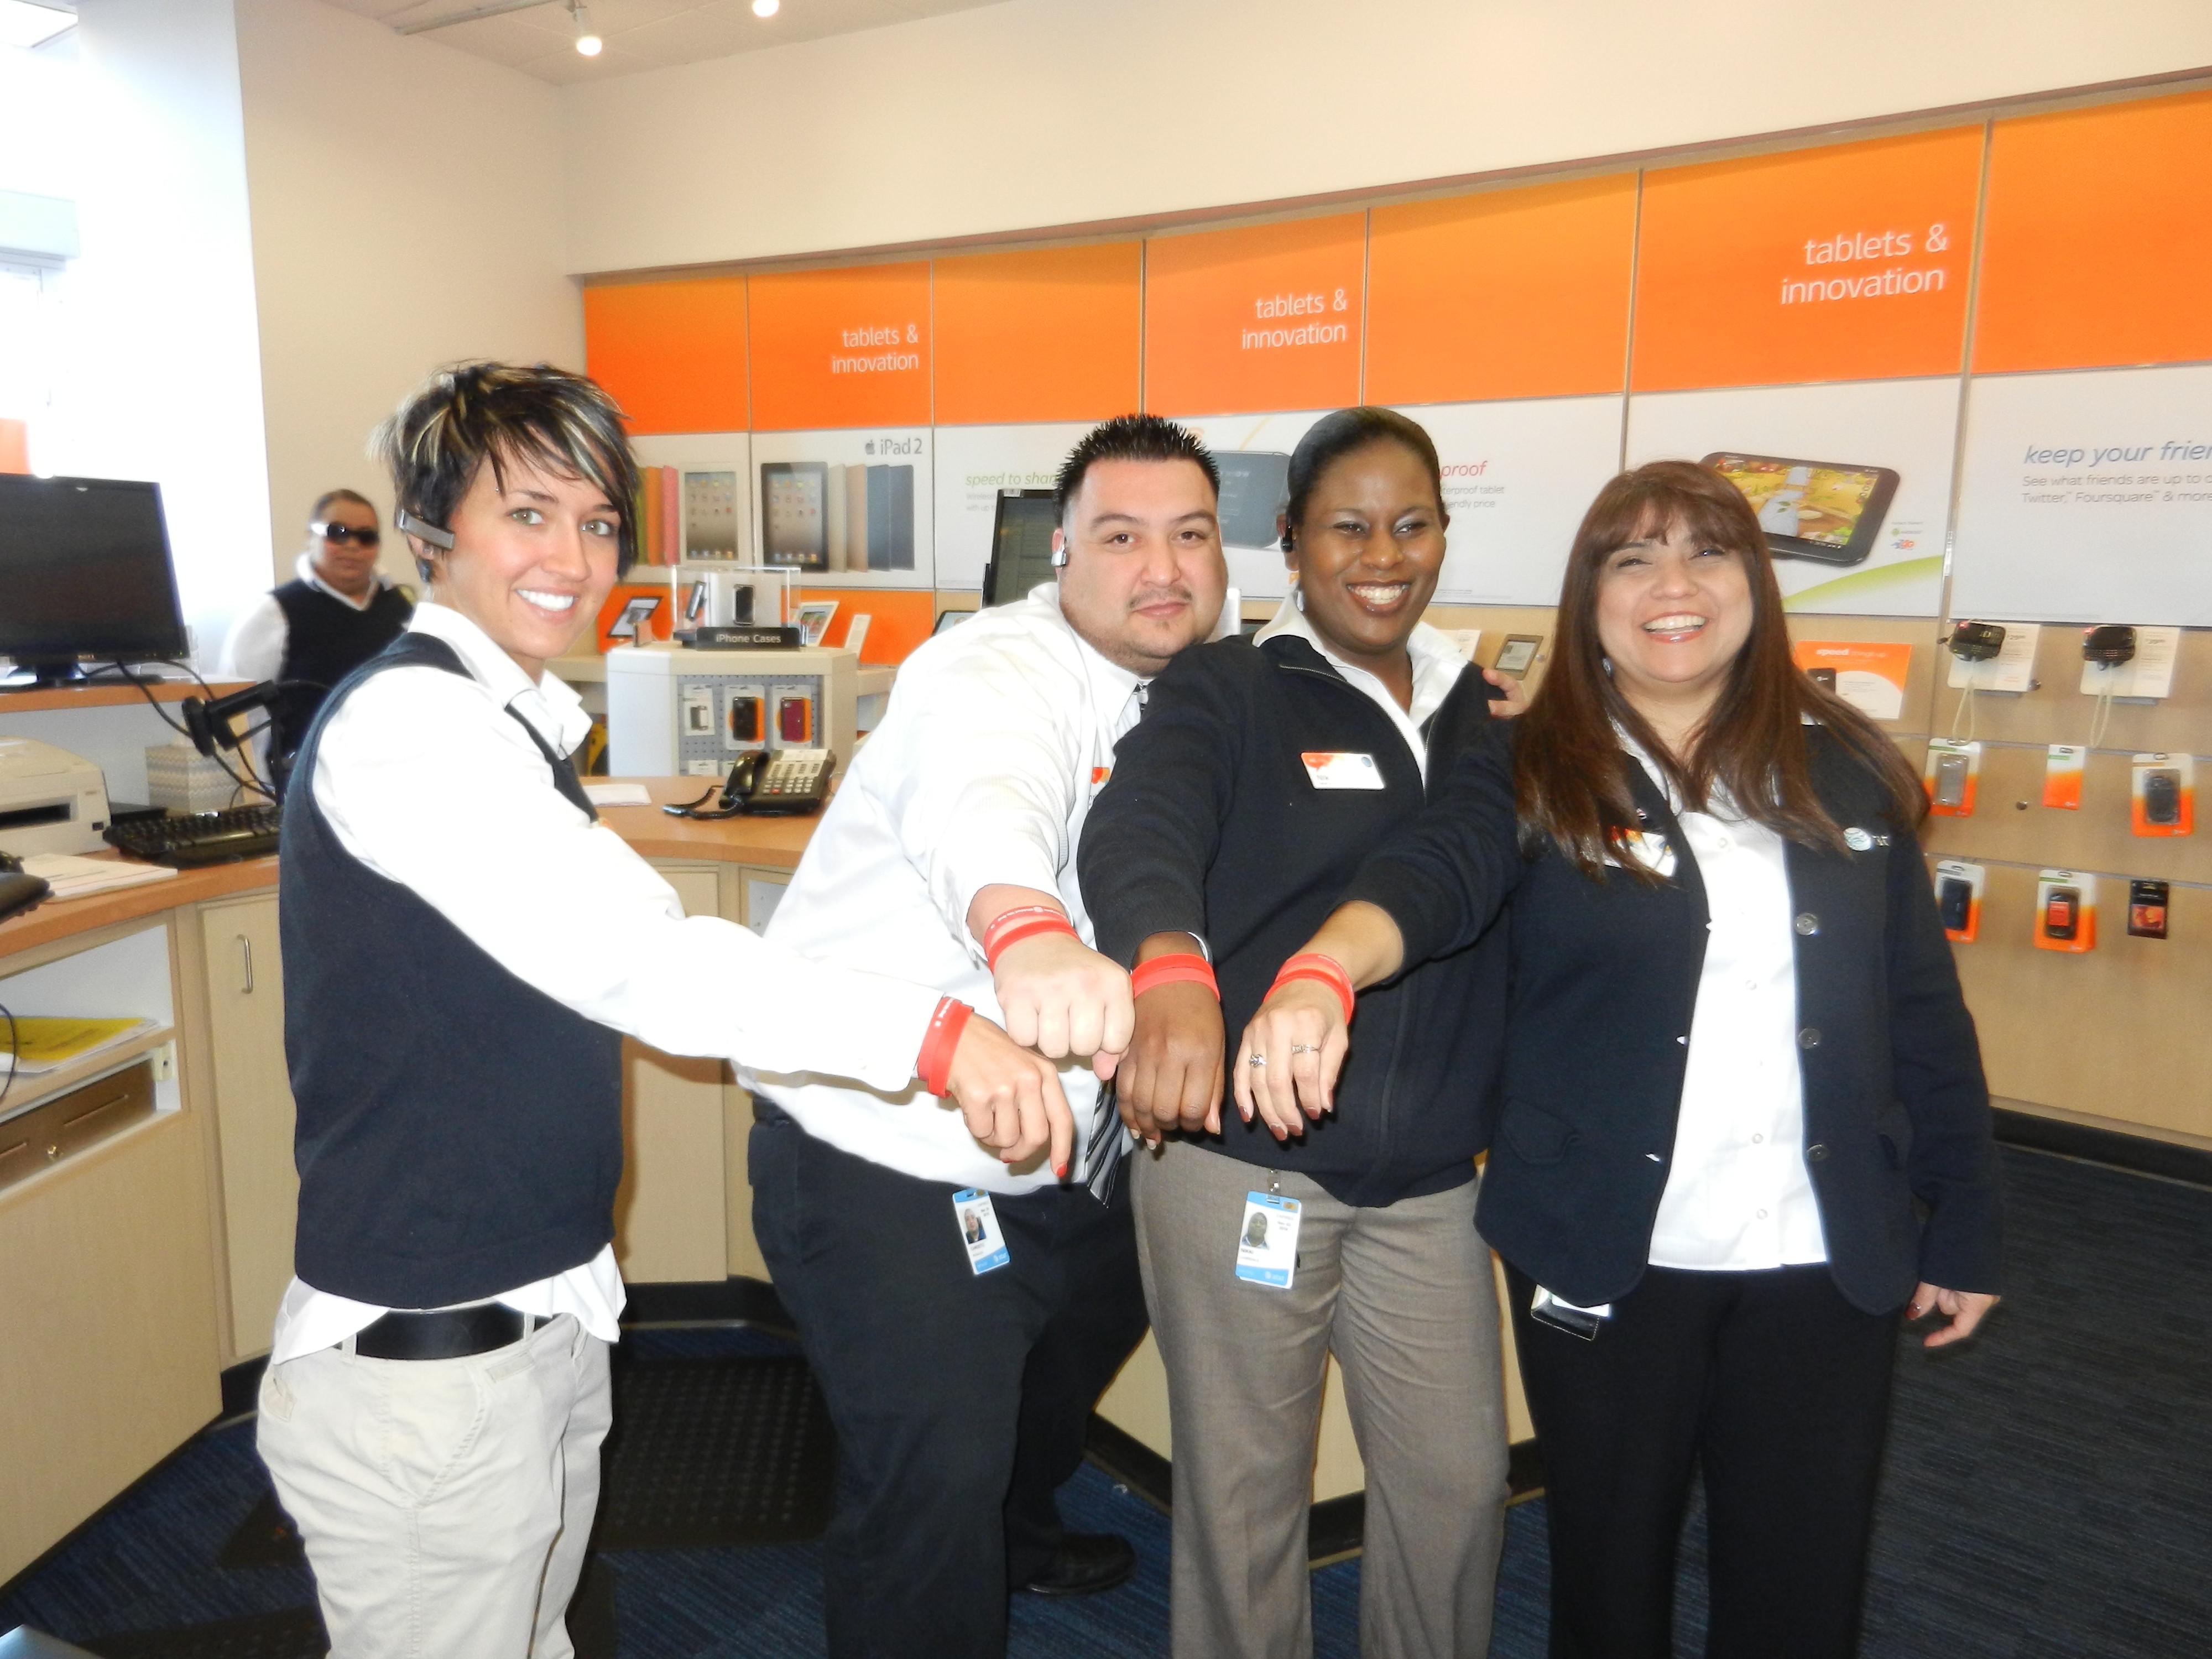 2012-01-28 L6215 stores